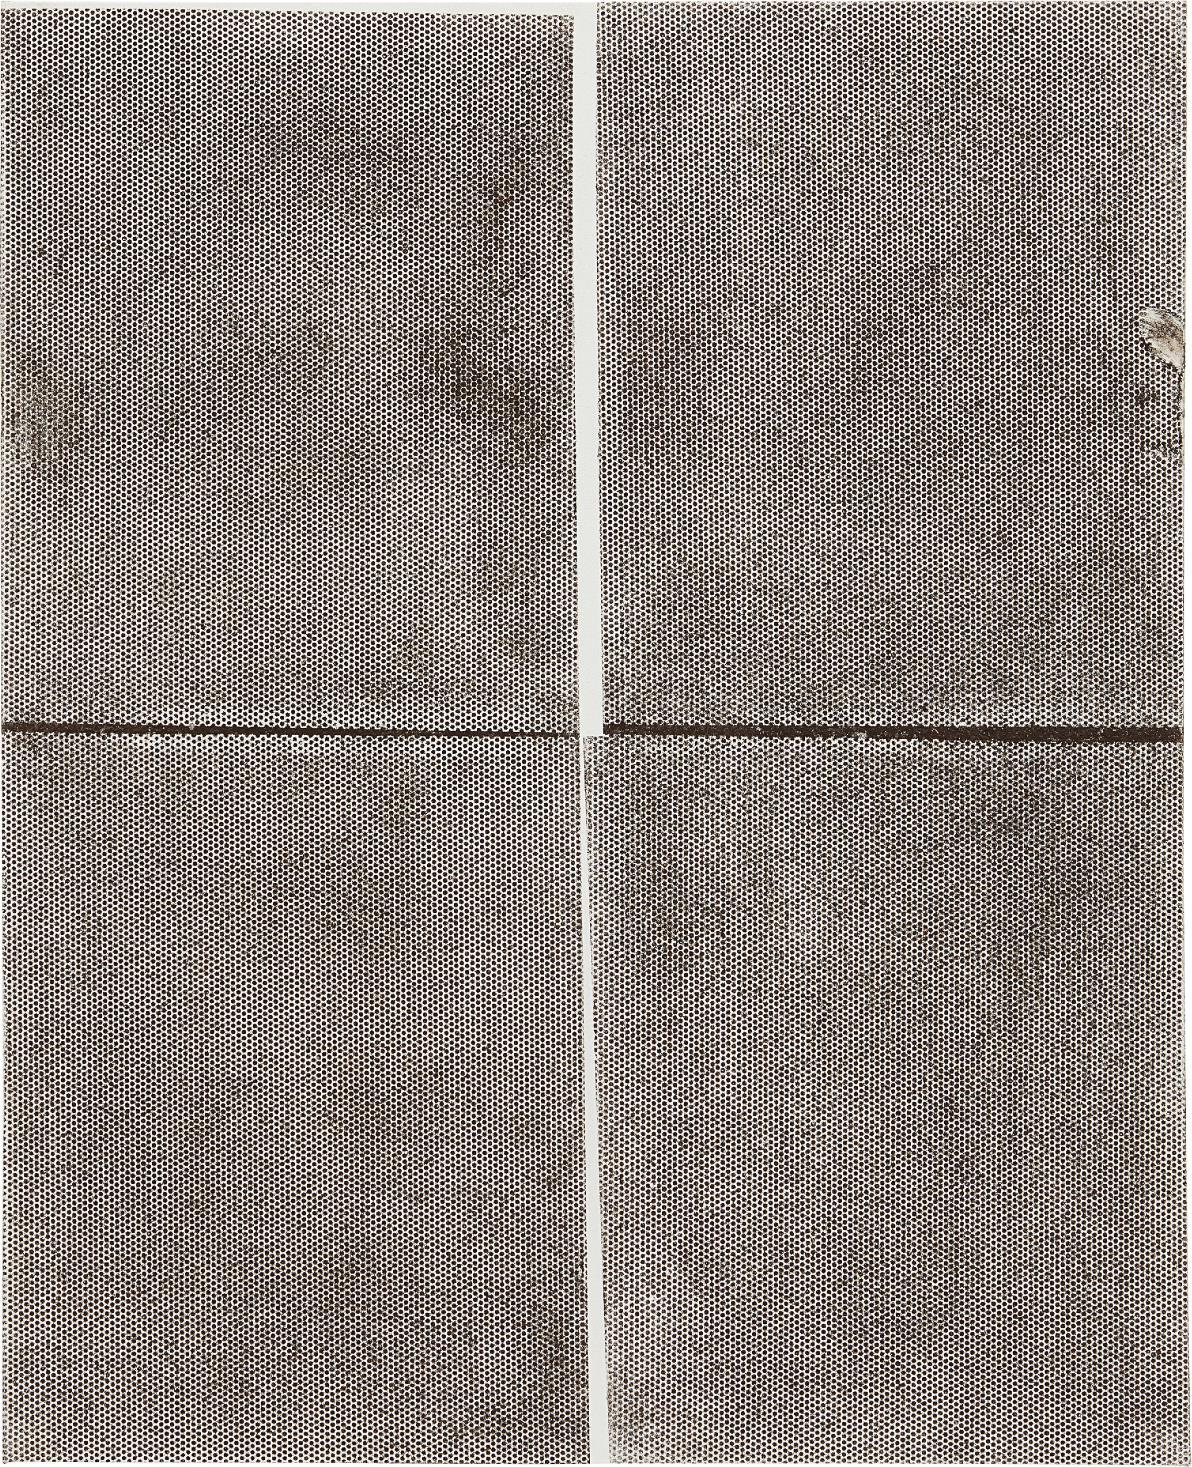 Ryan Estep-Sterilized Dirt Aa21-2014